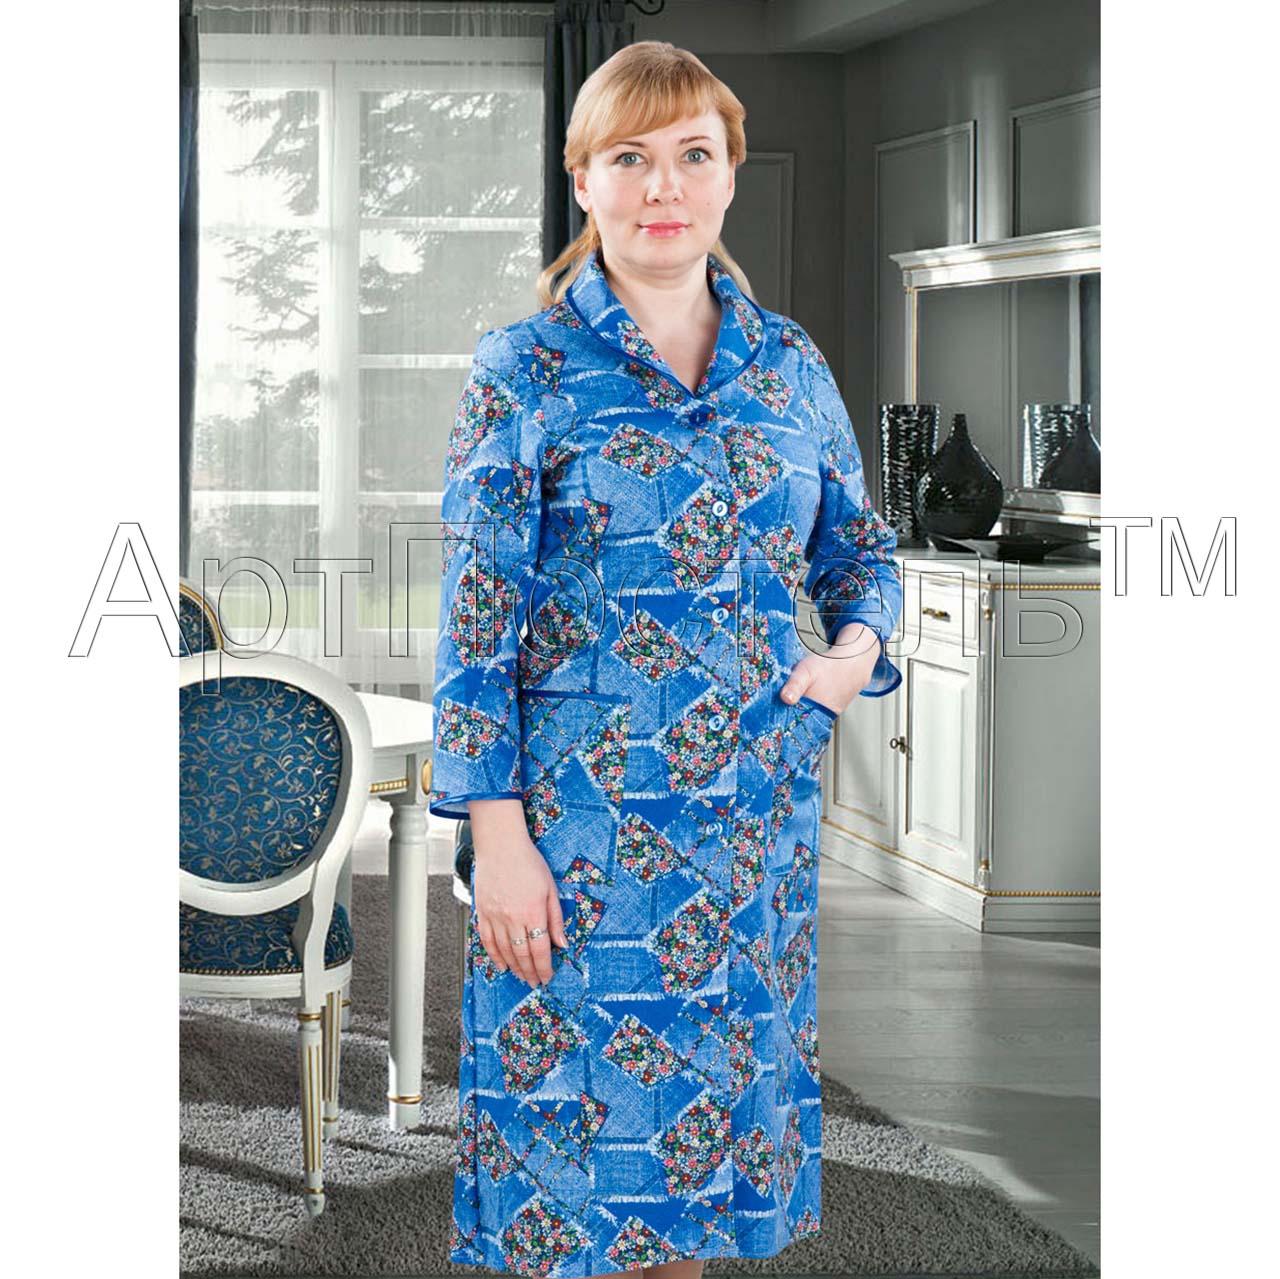 Жен. халат Американка на пуговицах р. 46Халаты<br>Обхват груди:92 см<br>Обхват талии:73 см<br>Обхват бедер:100 см<br>Рост:164-170 см<br><br>Тип: Жен. халат<br>Размер: 46<br>Материал: Фланель